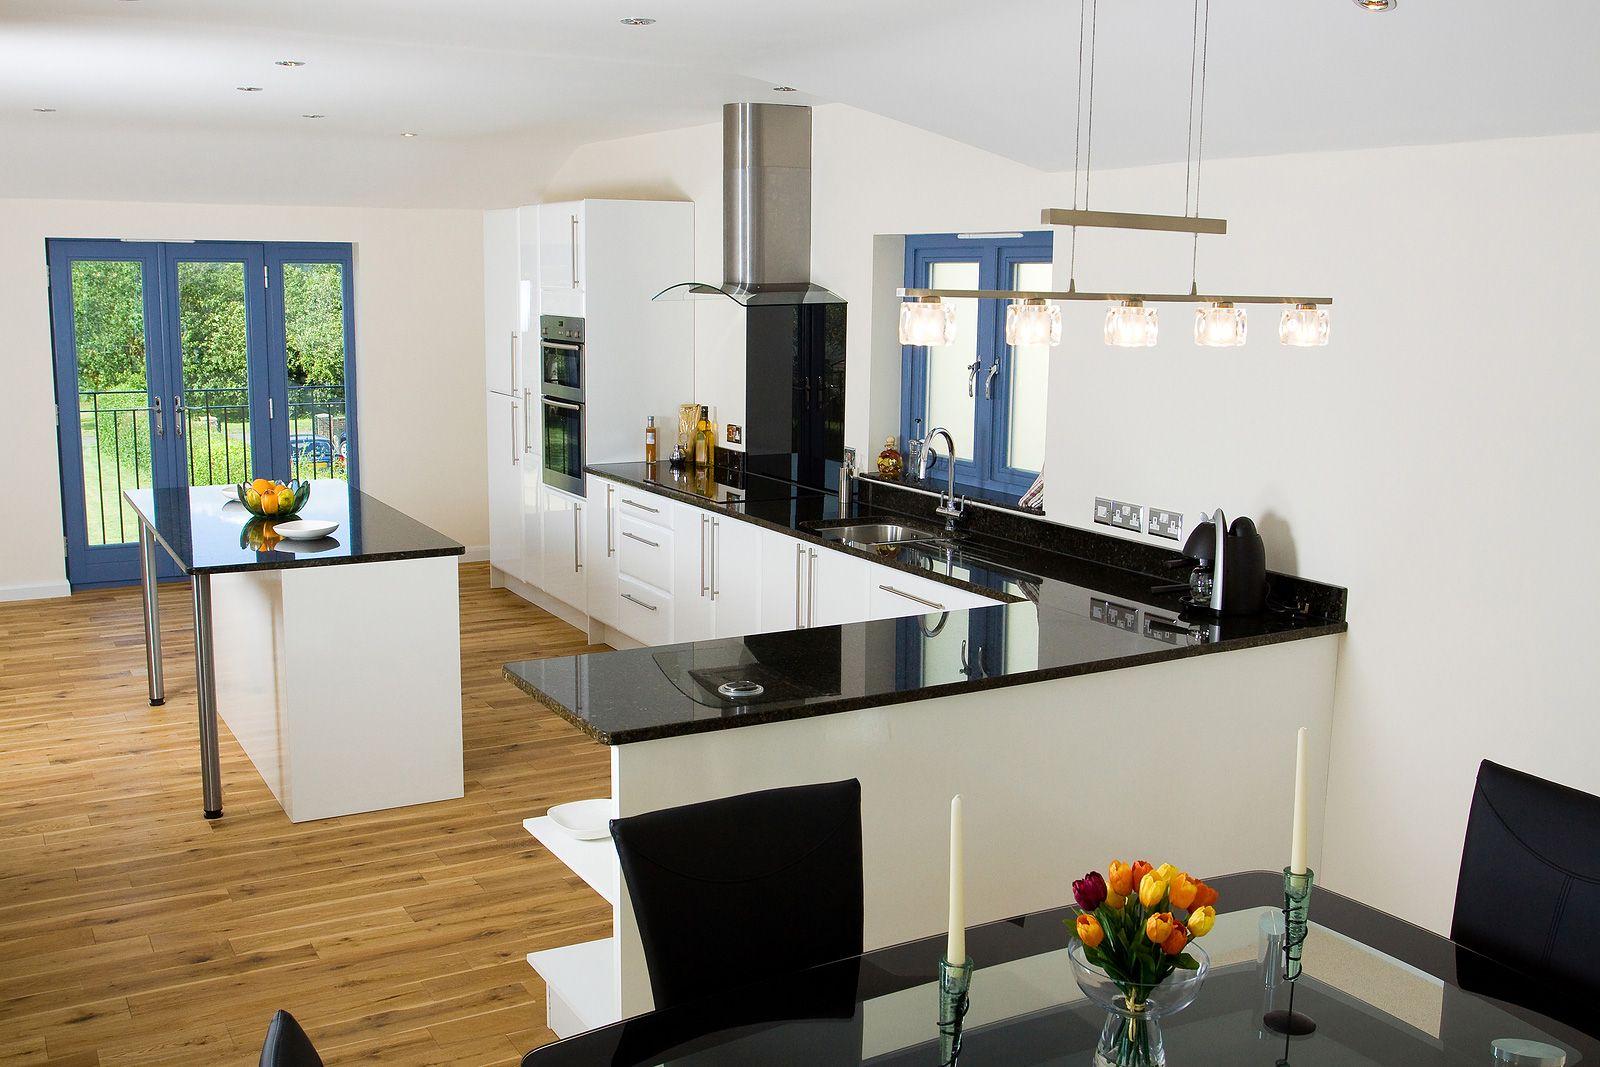 Bestkitchendecorationinwhiteandblack See More  Httpwww Adorable Interior Design Kitchens 2014 Design Decoration